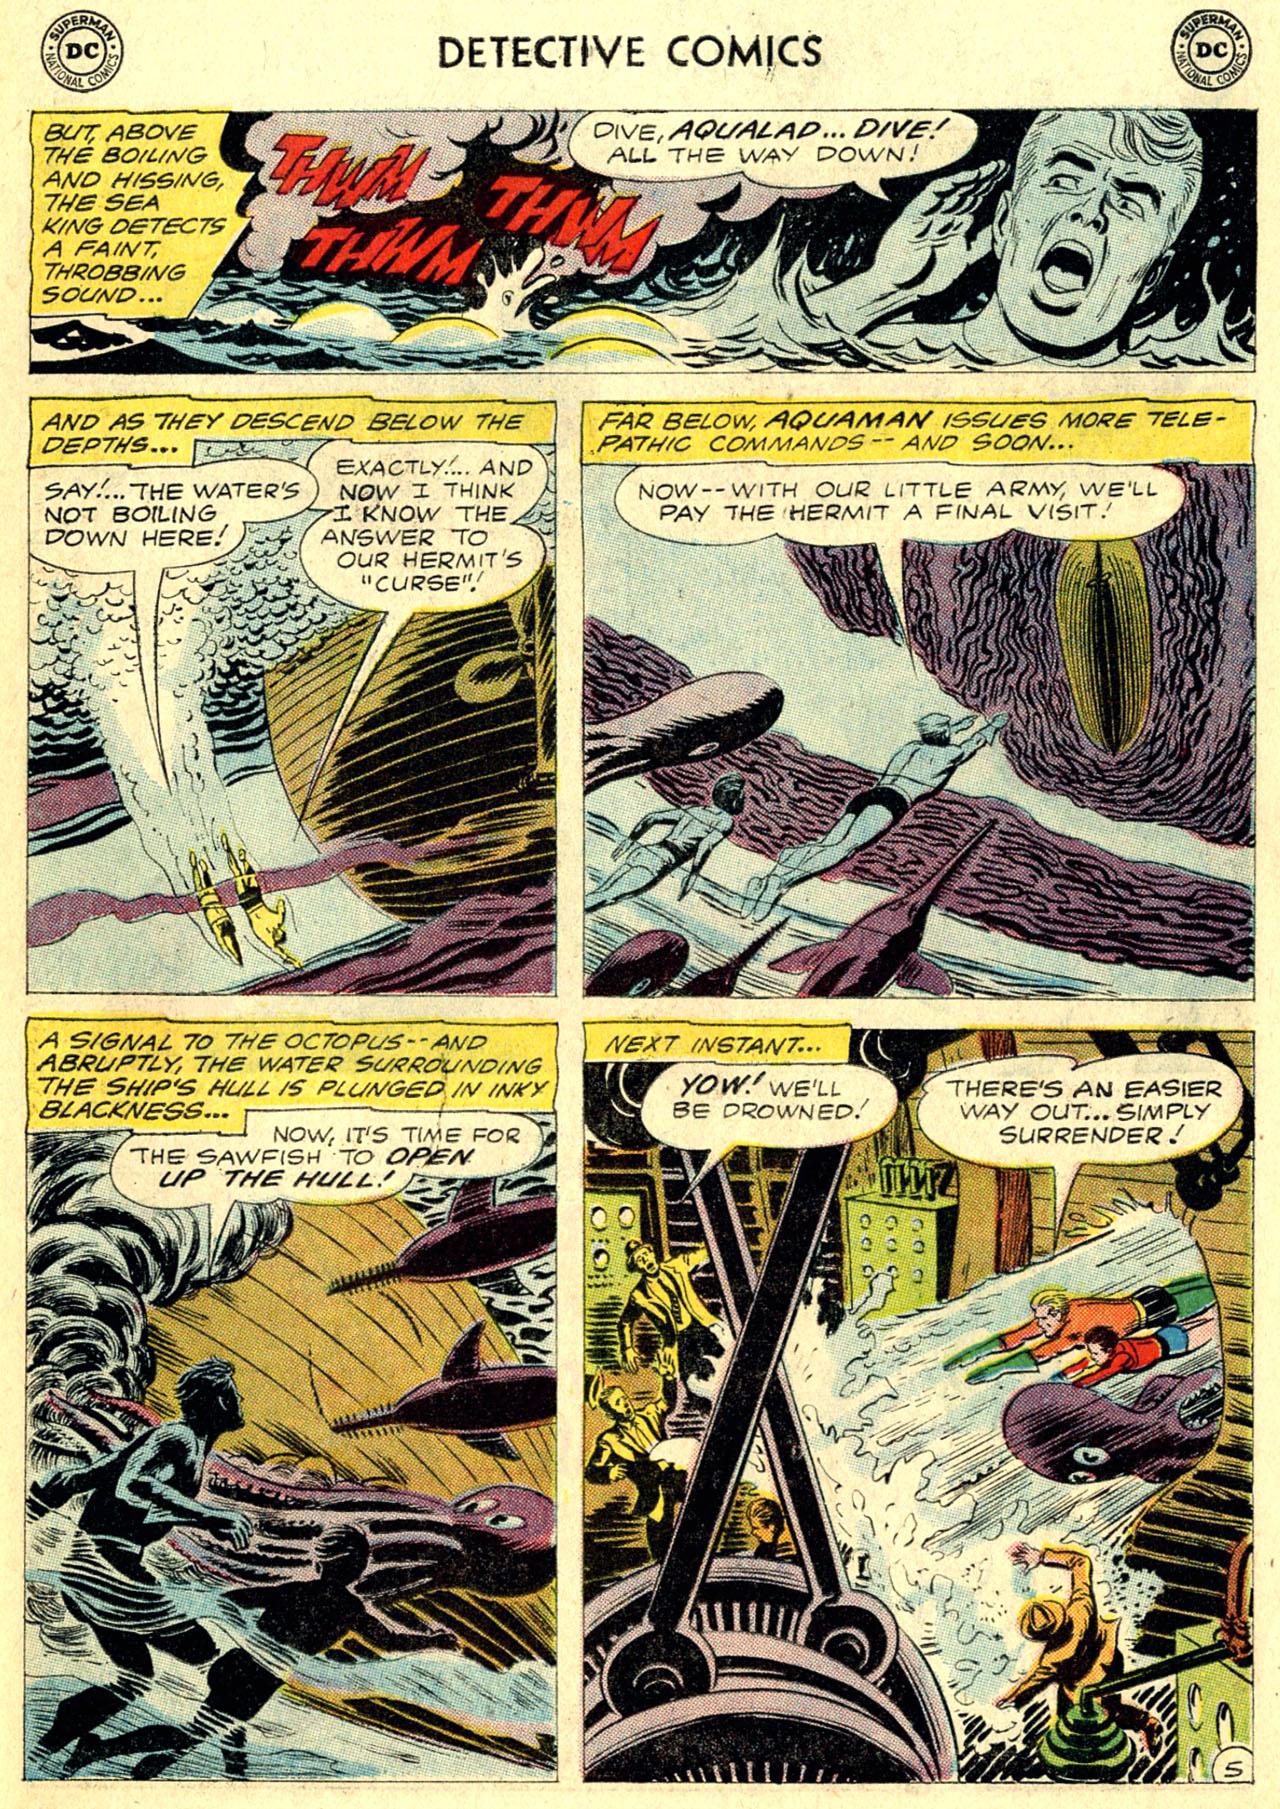 Detective Comics (1937) 295 Page 30